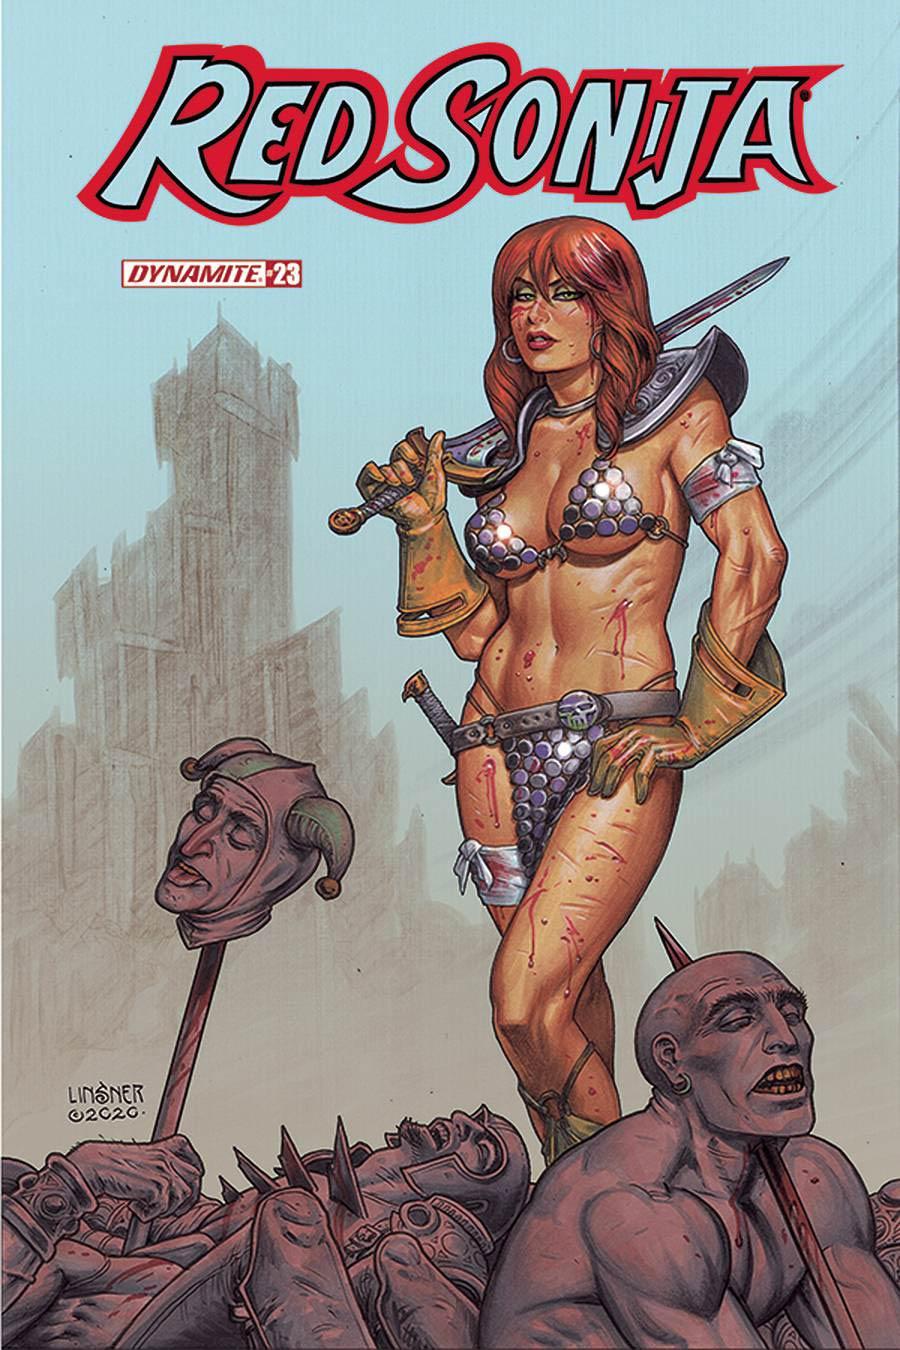 Red Sonja Vol 8 #23 Cover B Variant Joseph Michael Linsner Cover